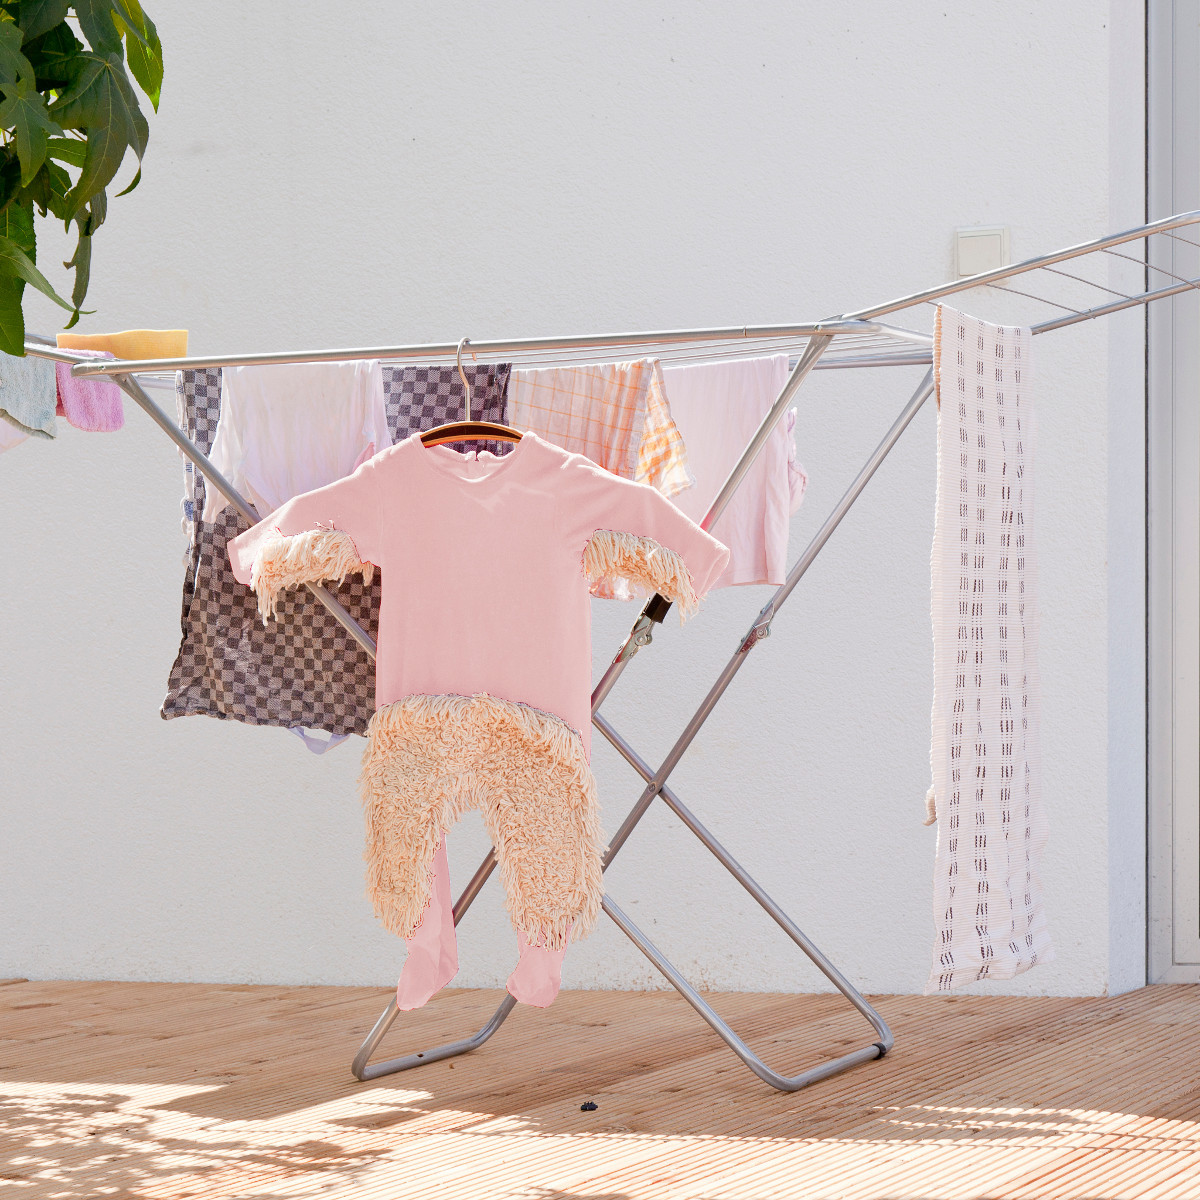 Grappig babymop kruippakje